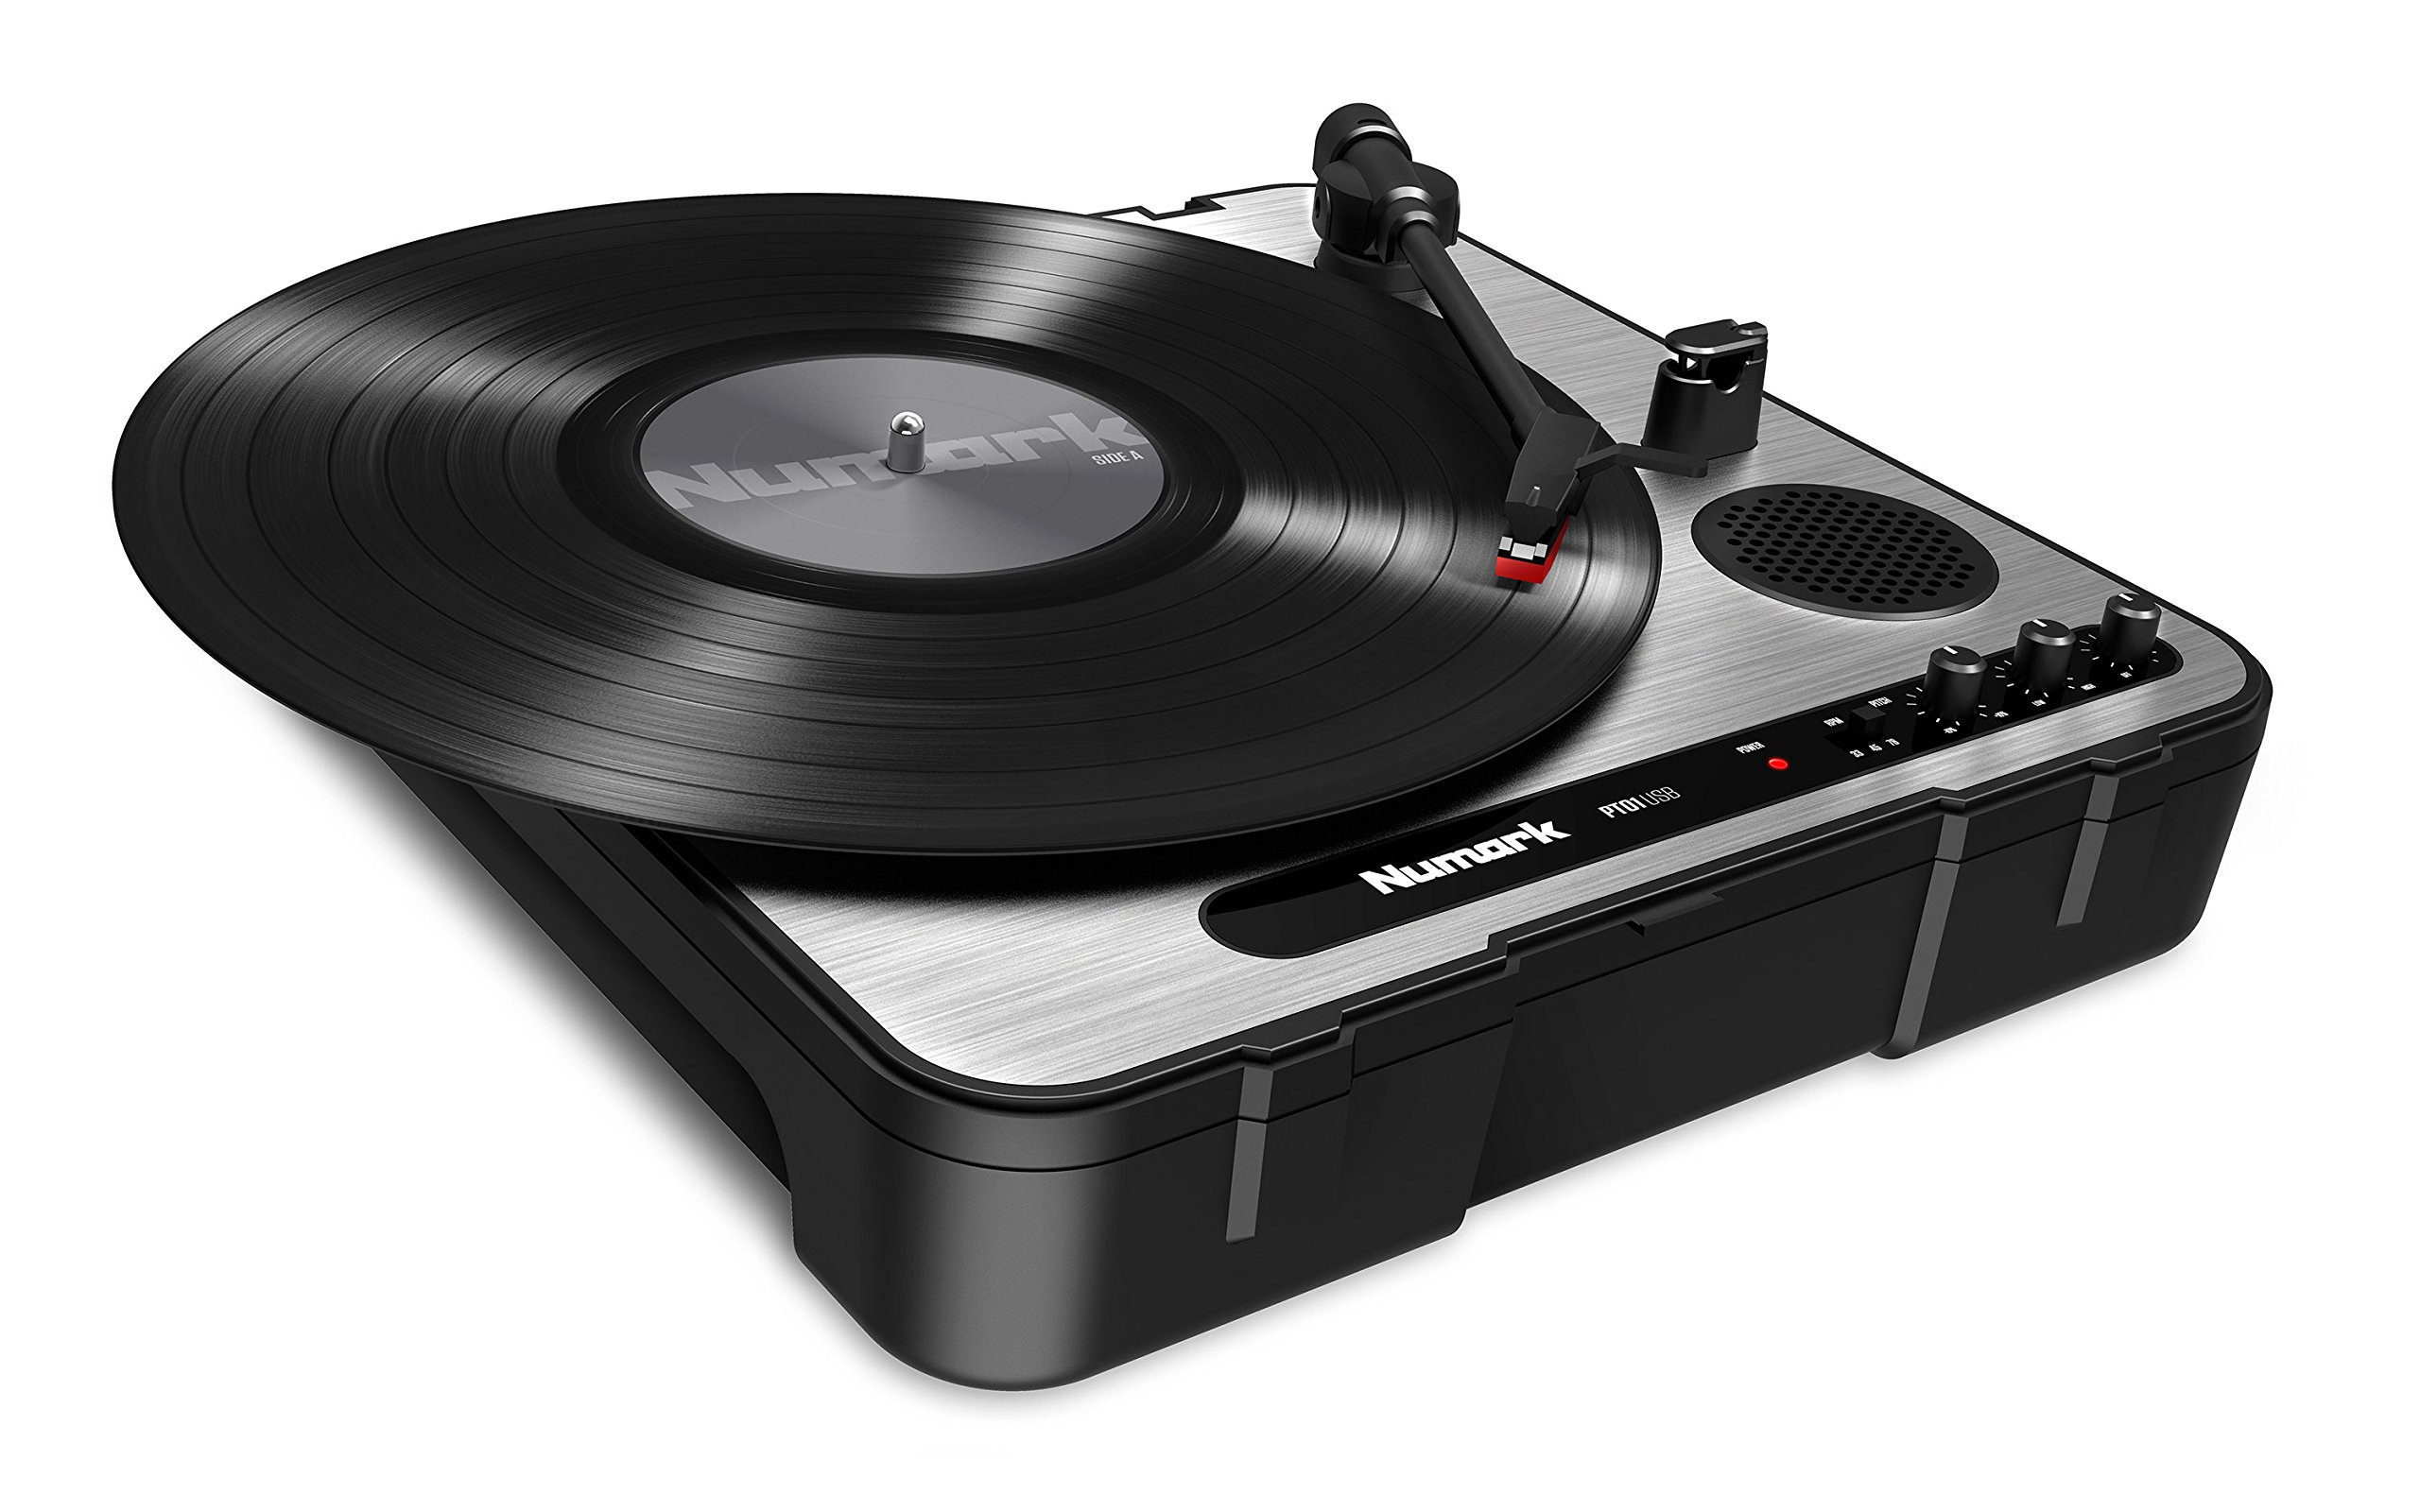 Numark PT01USB   Portable Vinyl-Archiving Turntable for 33 1/3, 45, & 78 RPM Records